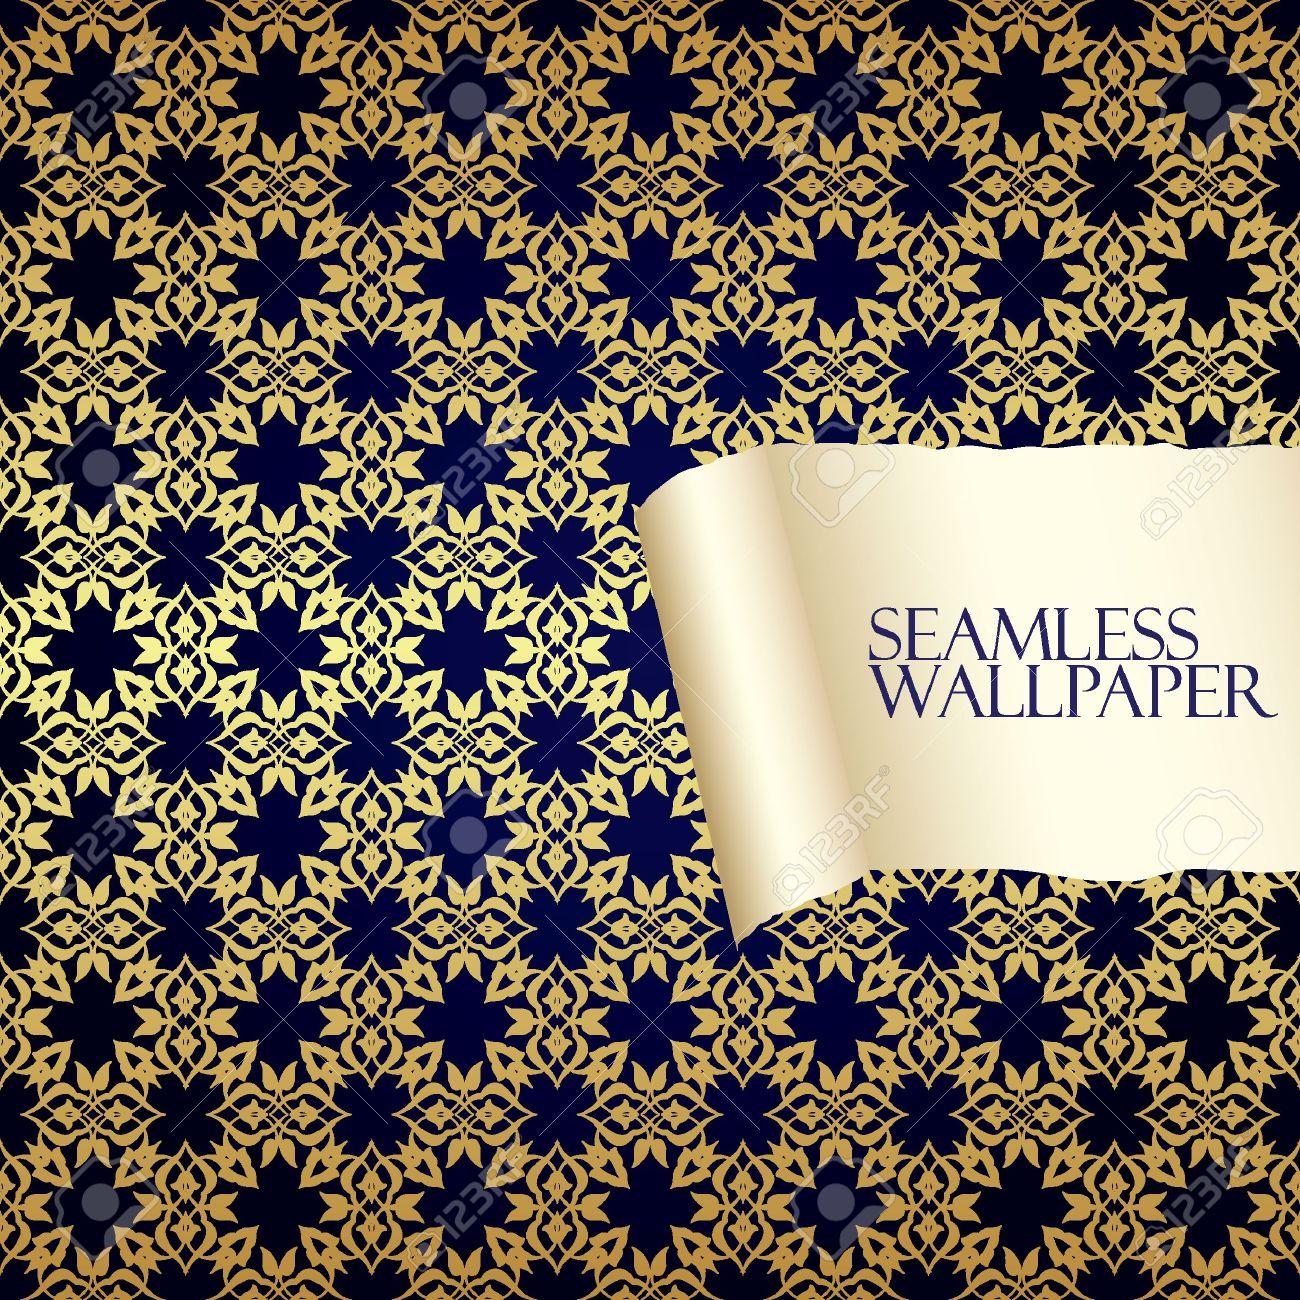 Seamless Orientalisk Tapet Royalty-Fri Clipart, Vektorer Och ...